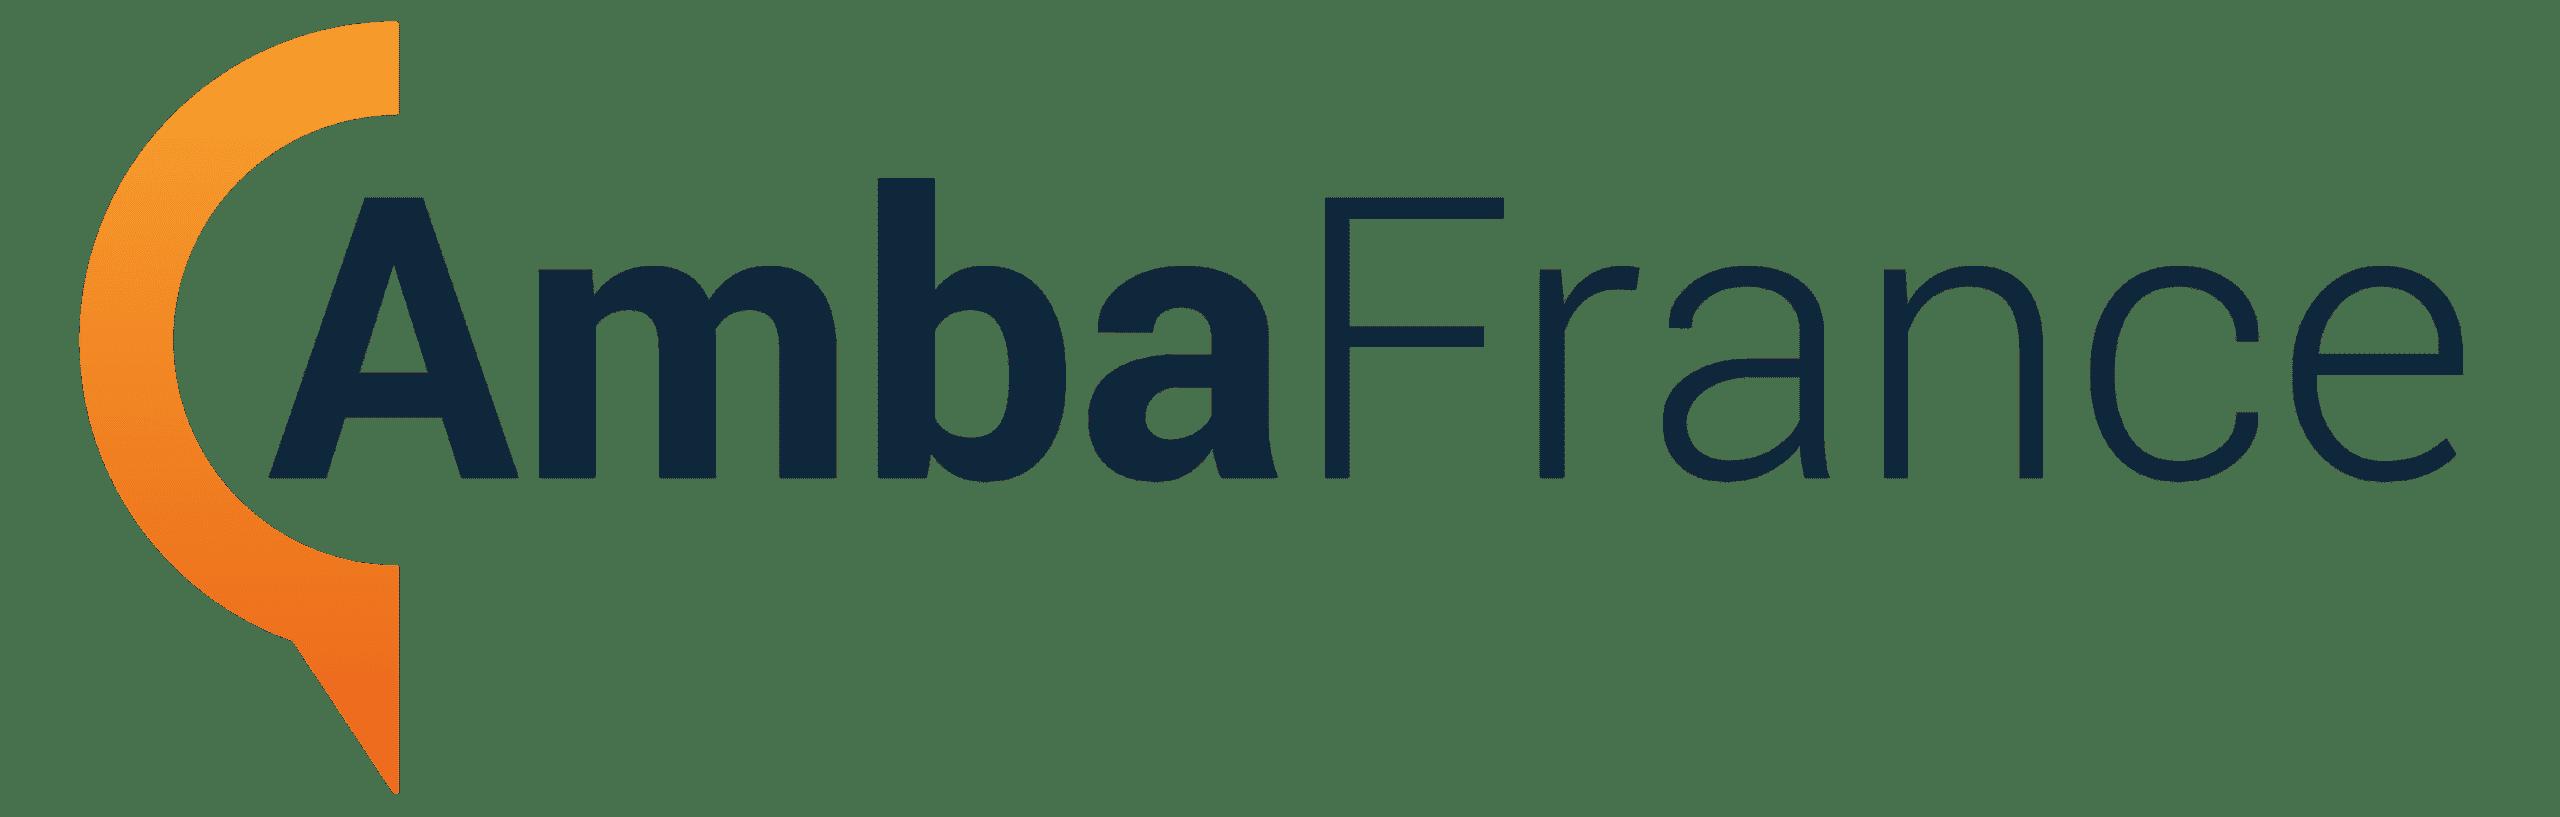 AmbaFrance